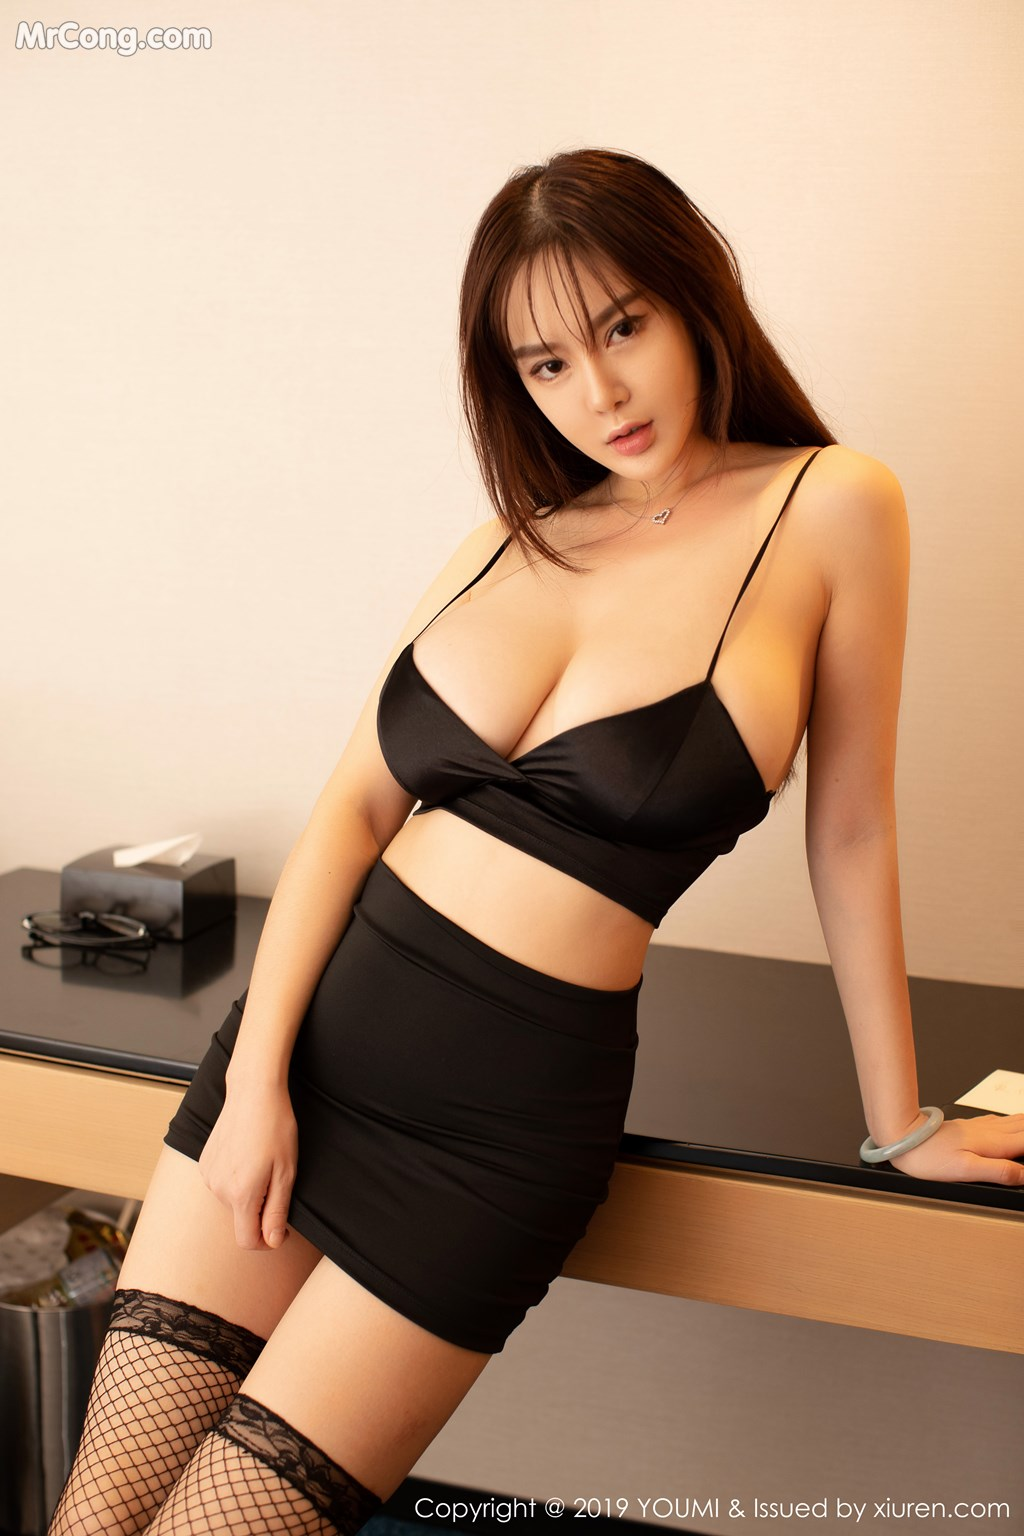 Image YouMi-Vol.311-Silvia-MrCong.com-026 in post YouMi Vol.311: 易阳Silvia (46 ảnh)